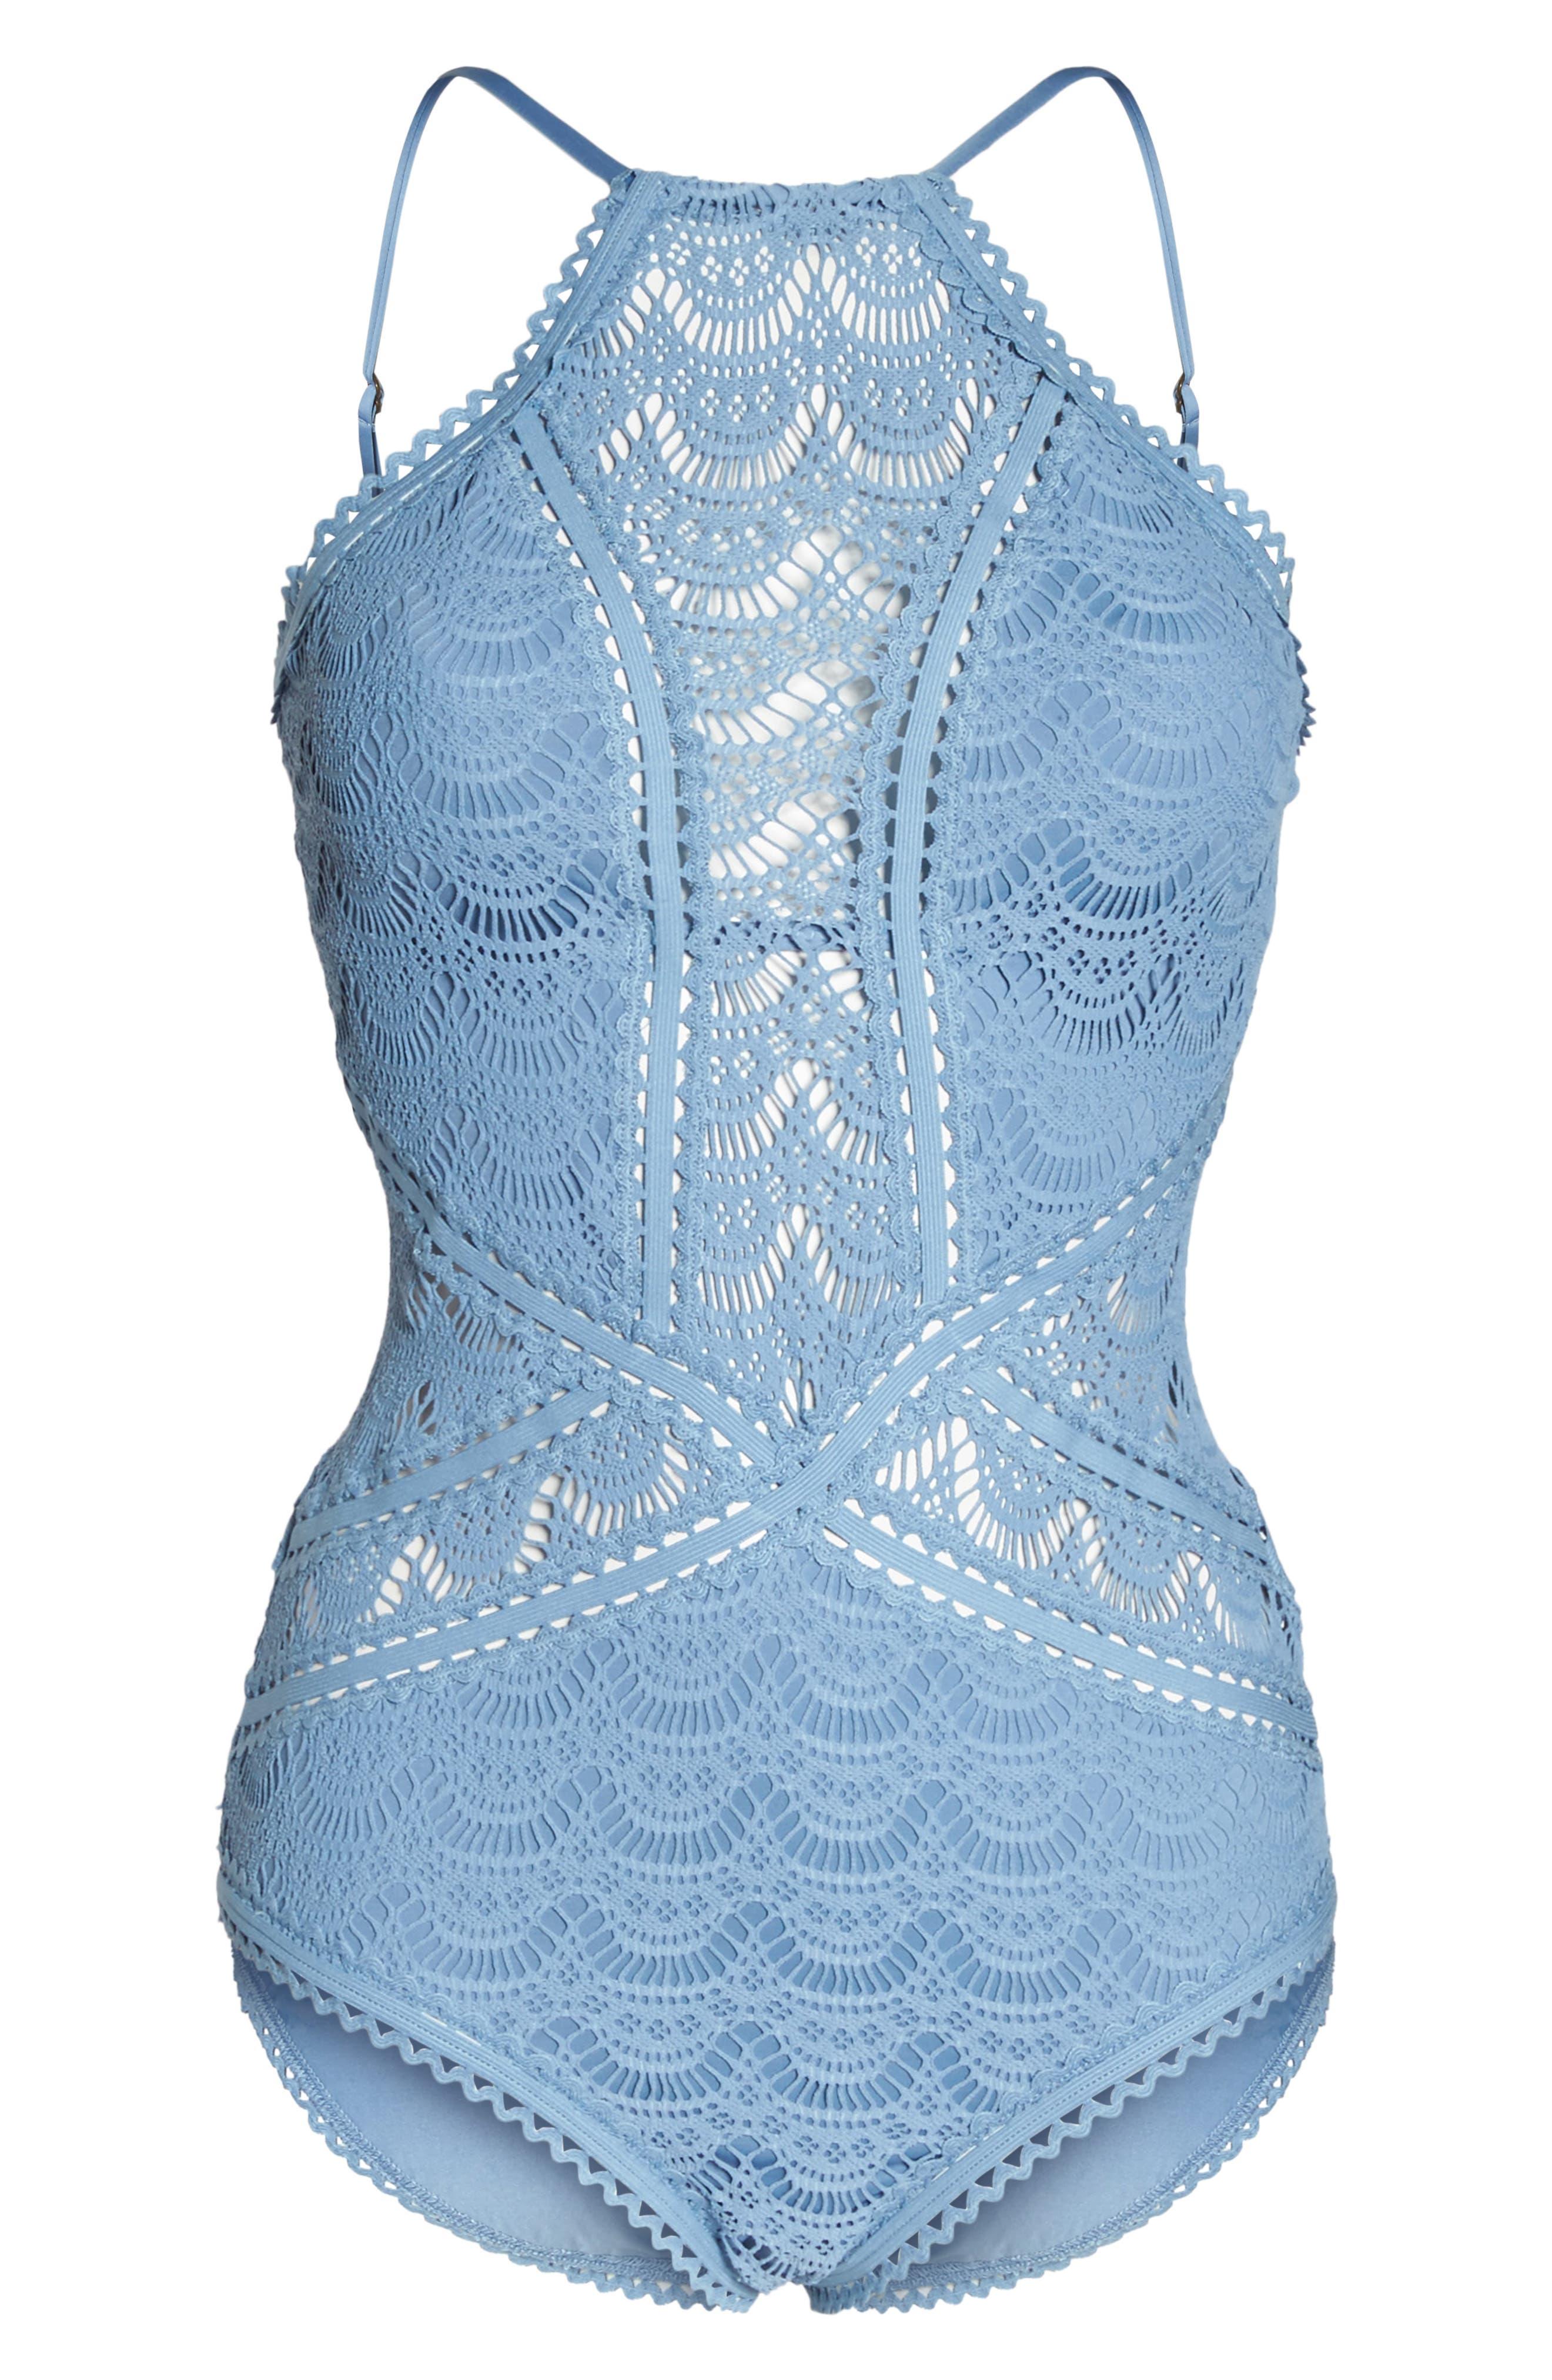 Crochet One-Piece Swimsuit,                             Alternate thumbnail 6, color,                             Steel